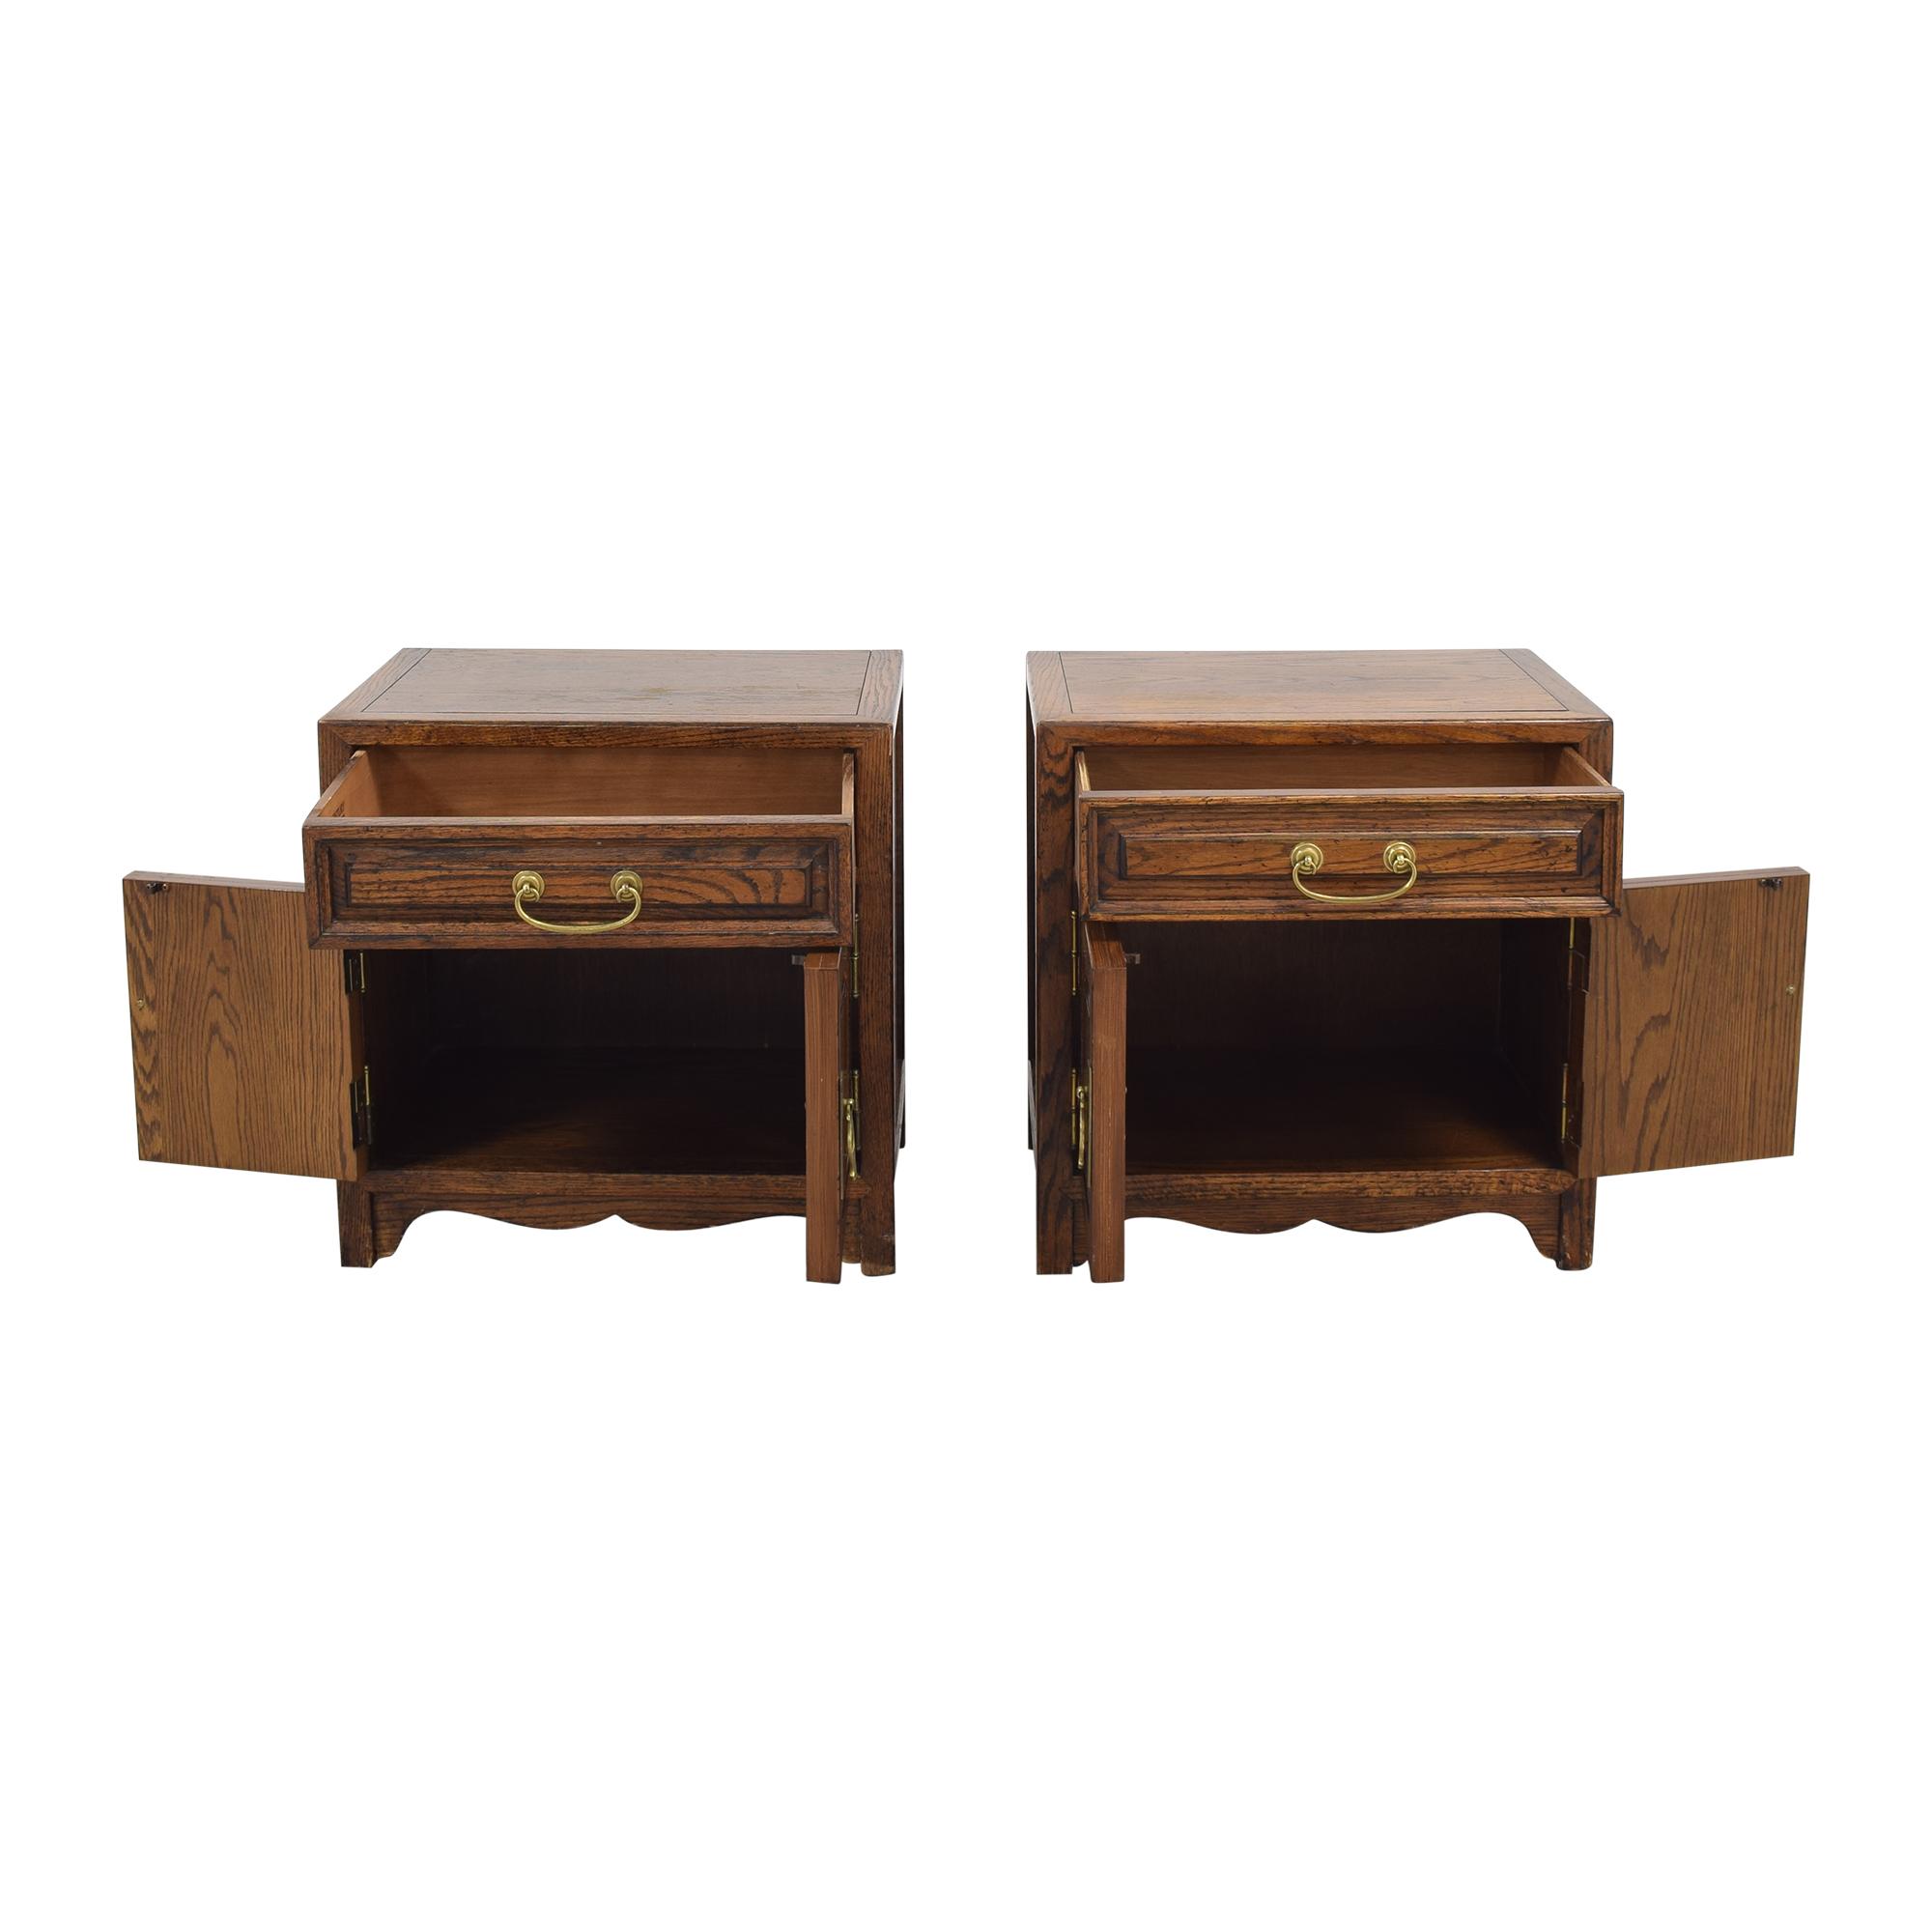 Century Furniture Century Furniture Nightstands on sale